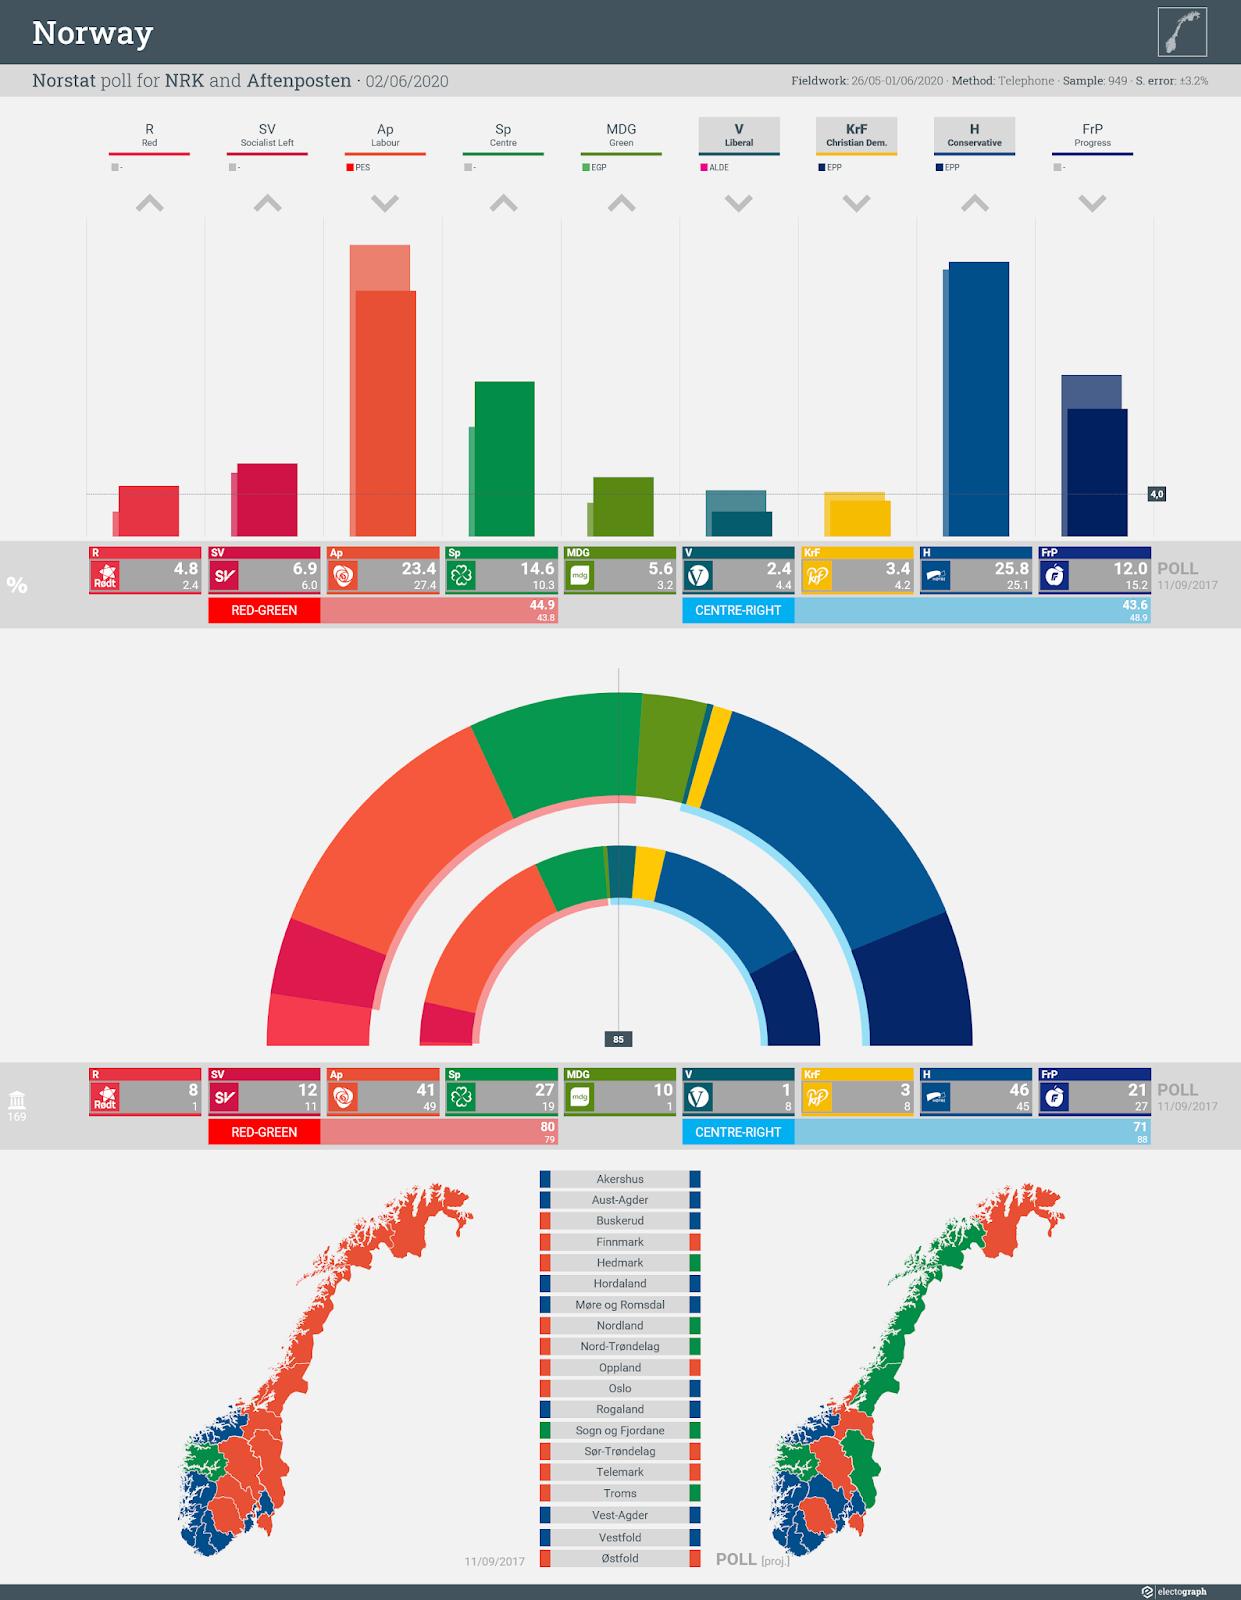 NORWAY: Norstat poll chart for NRK and Aftenposten, 2 June 2020